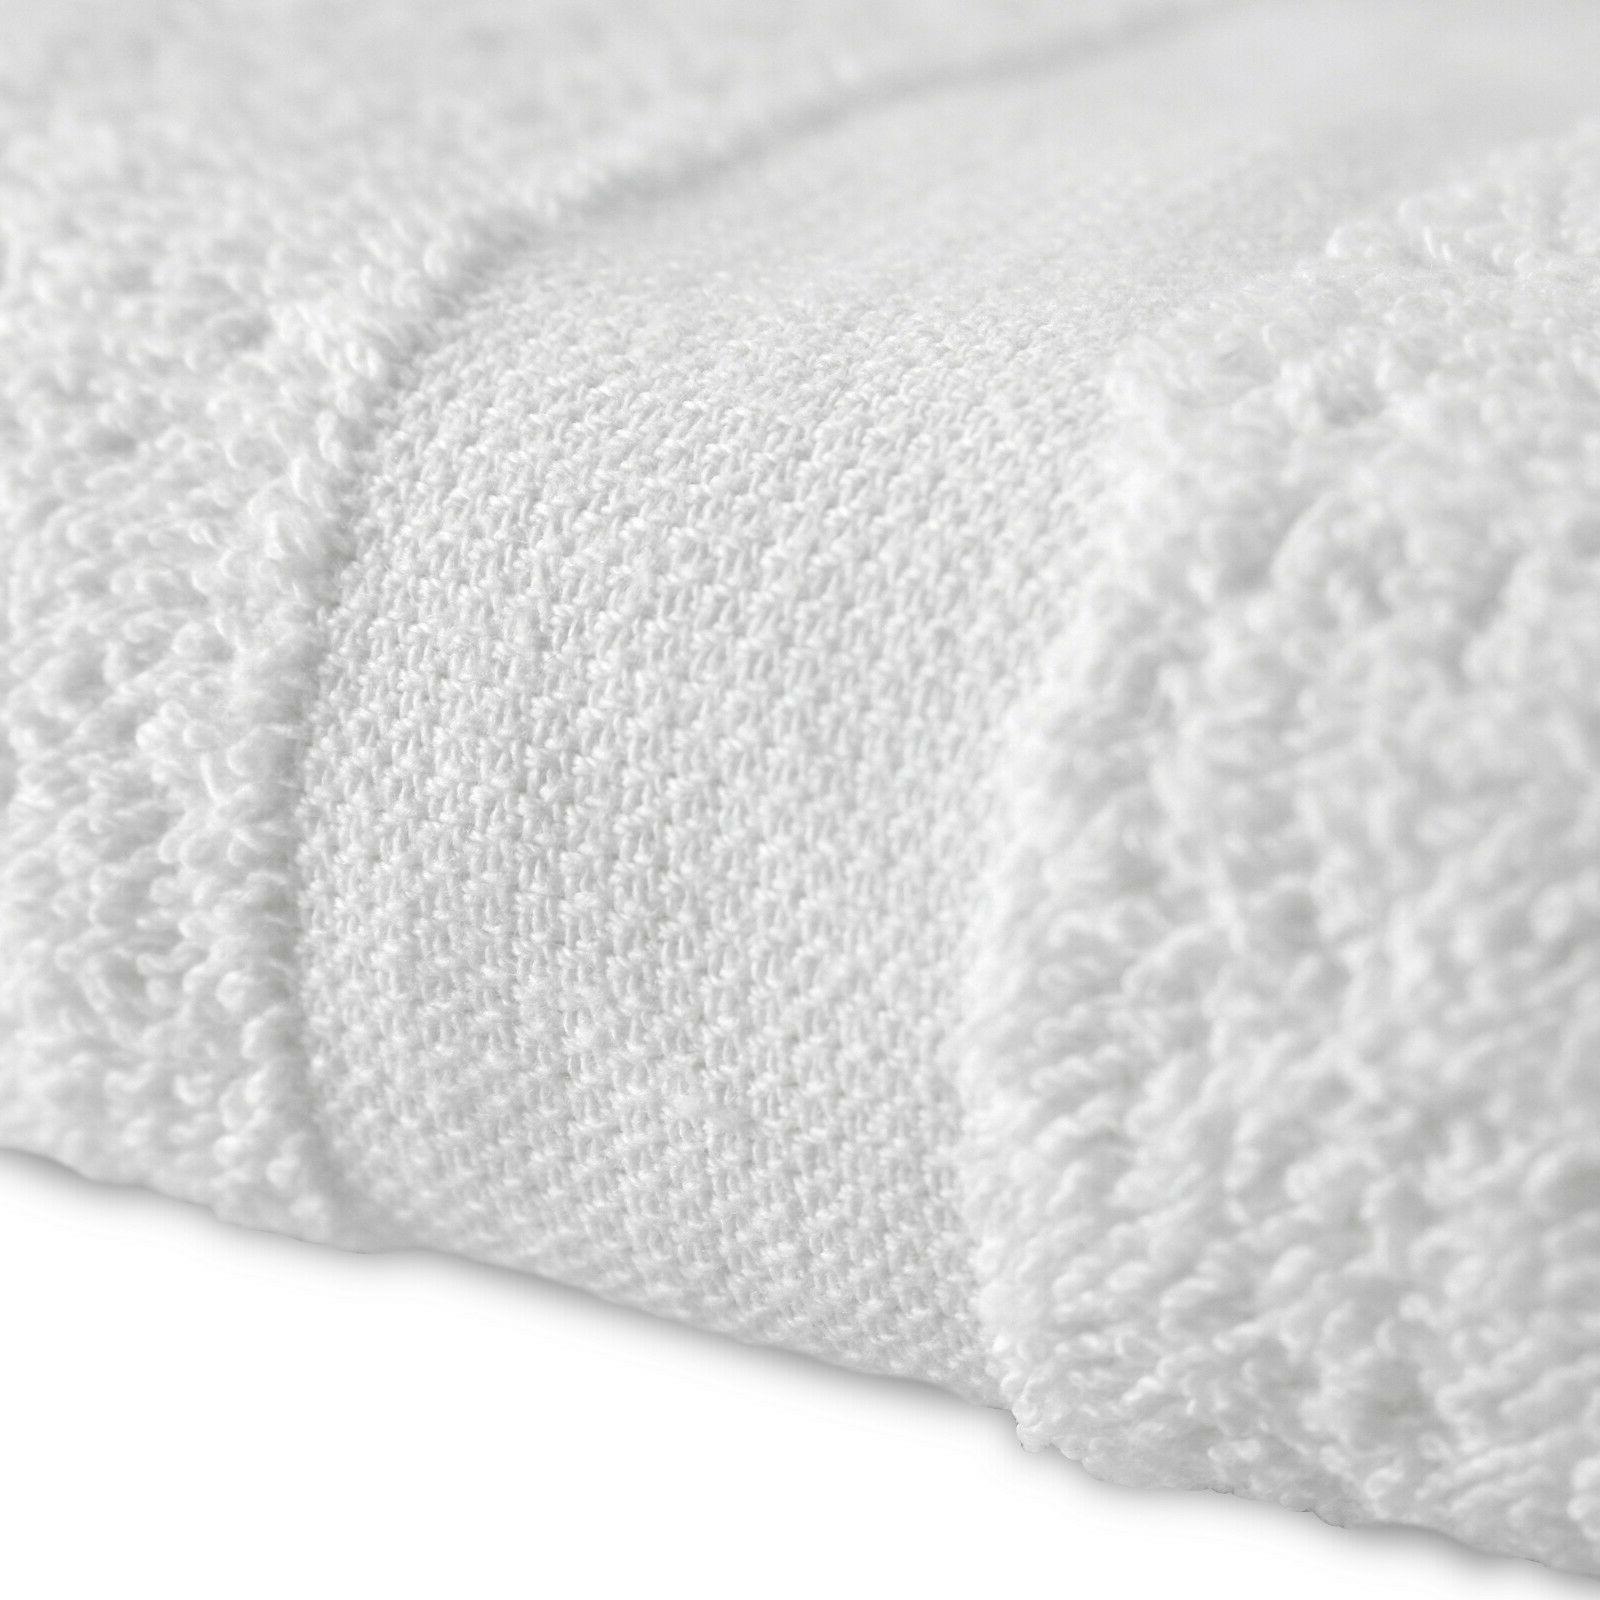 12 of Hand Towels - - 16 27 - Towels